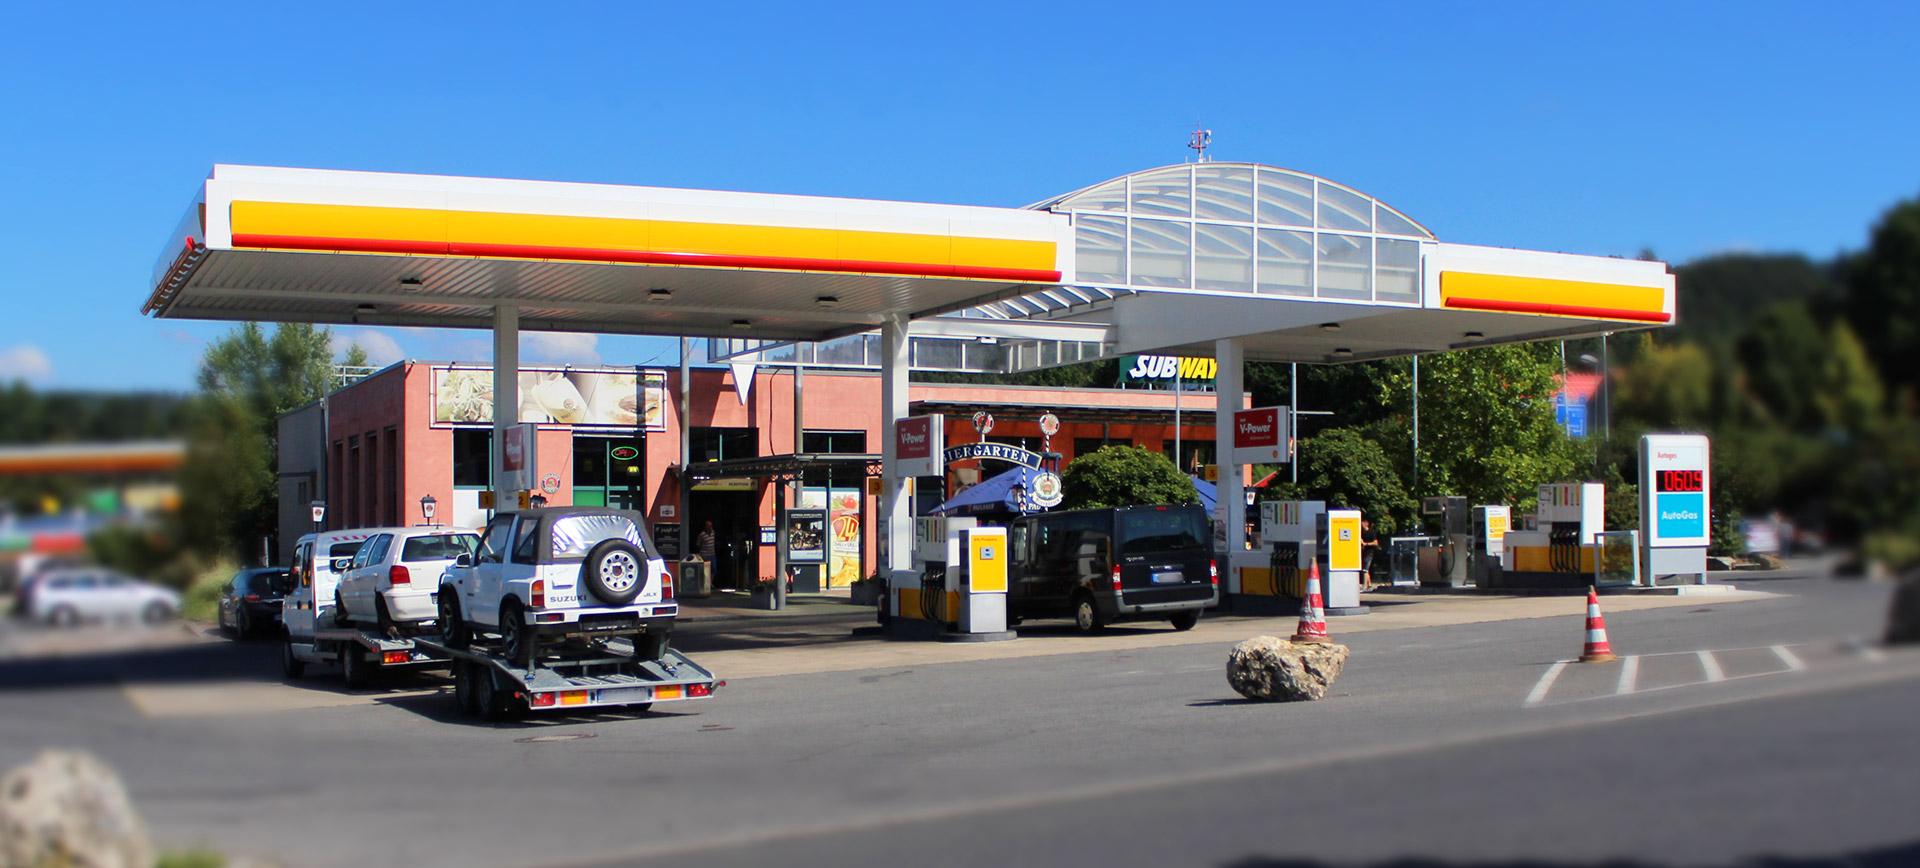 24 Shell Autohof Neumarkt